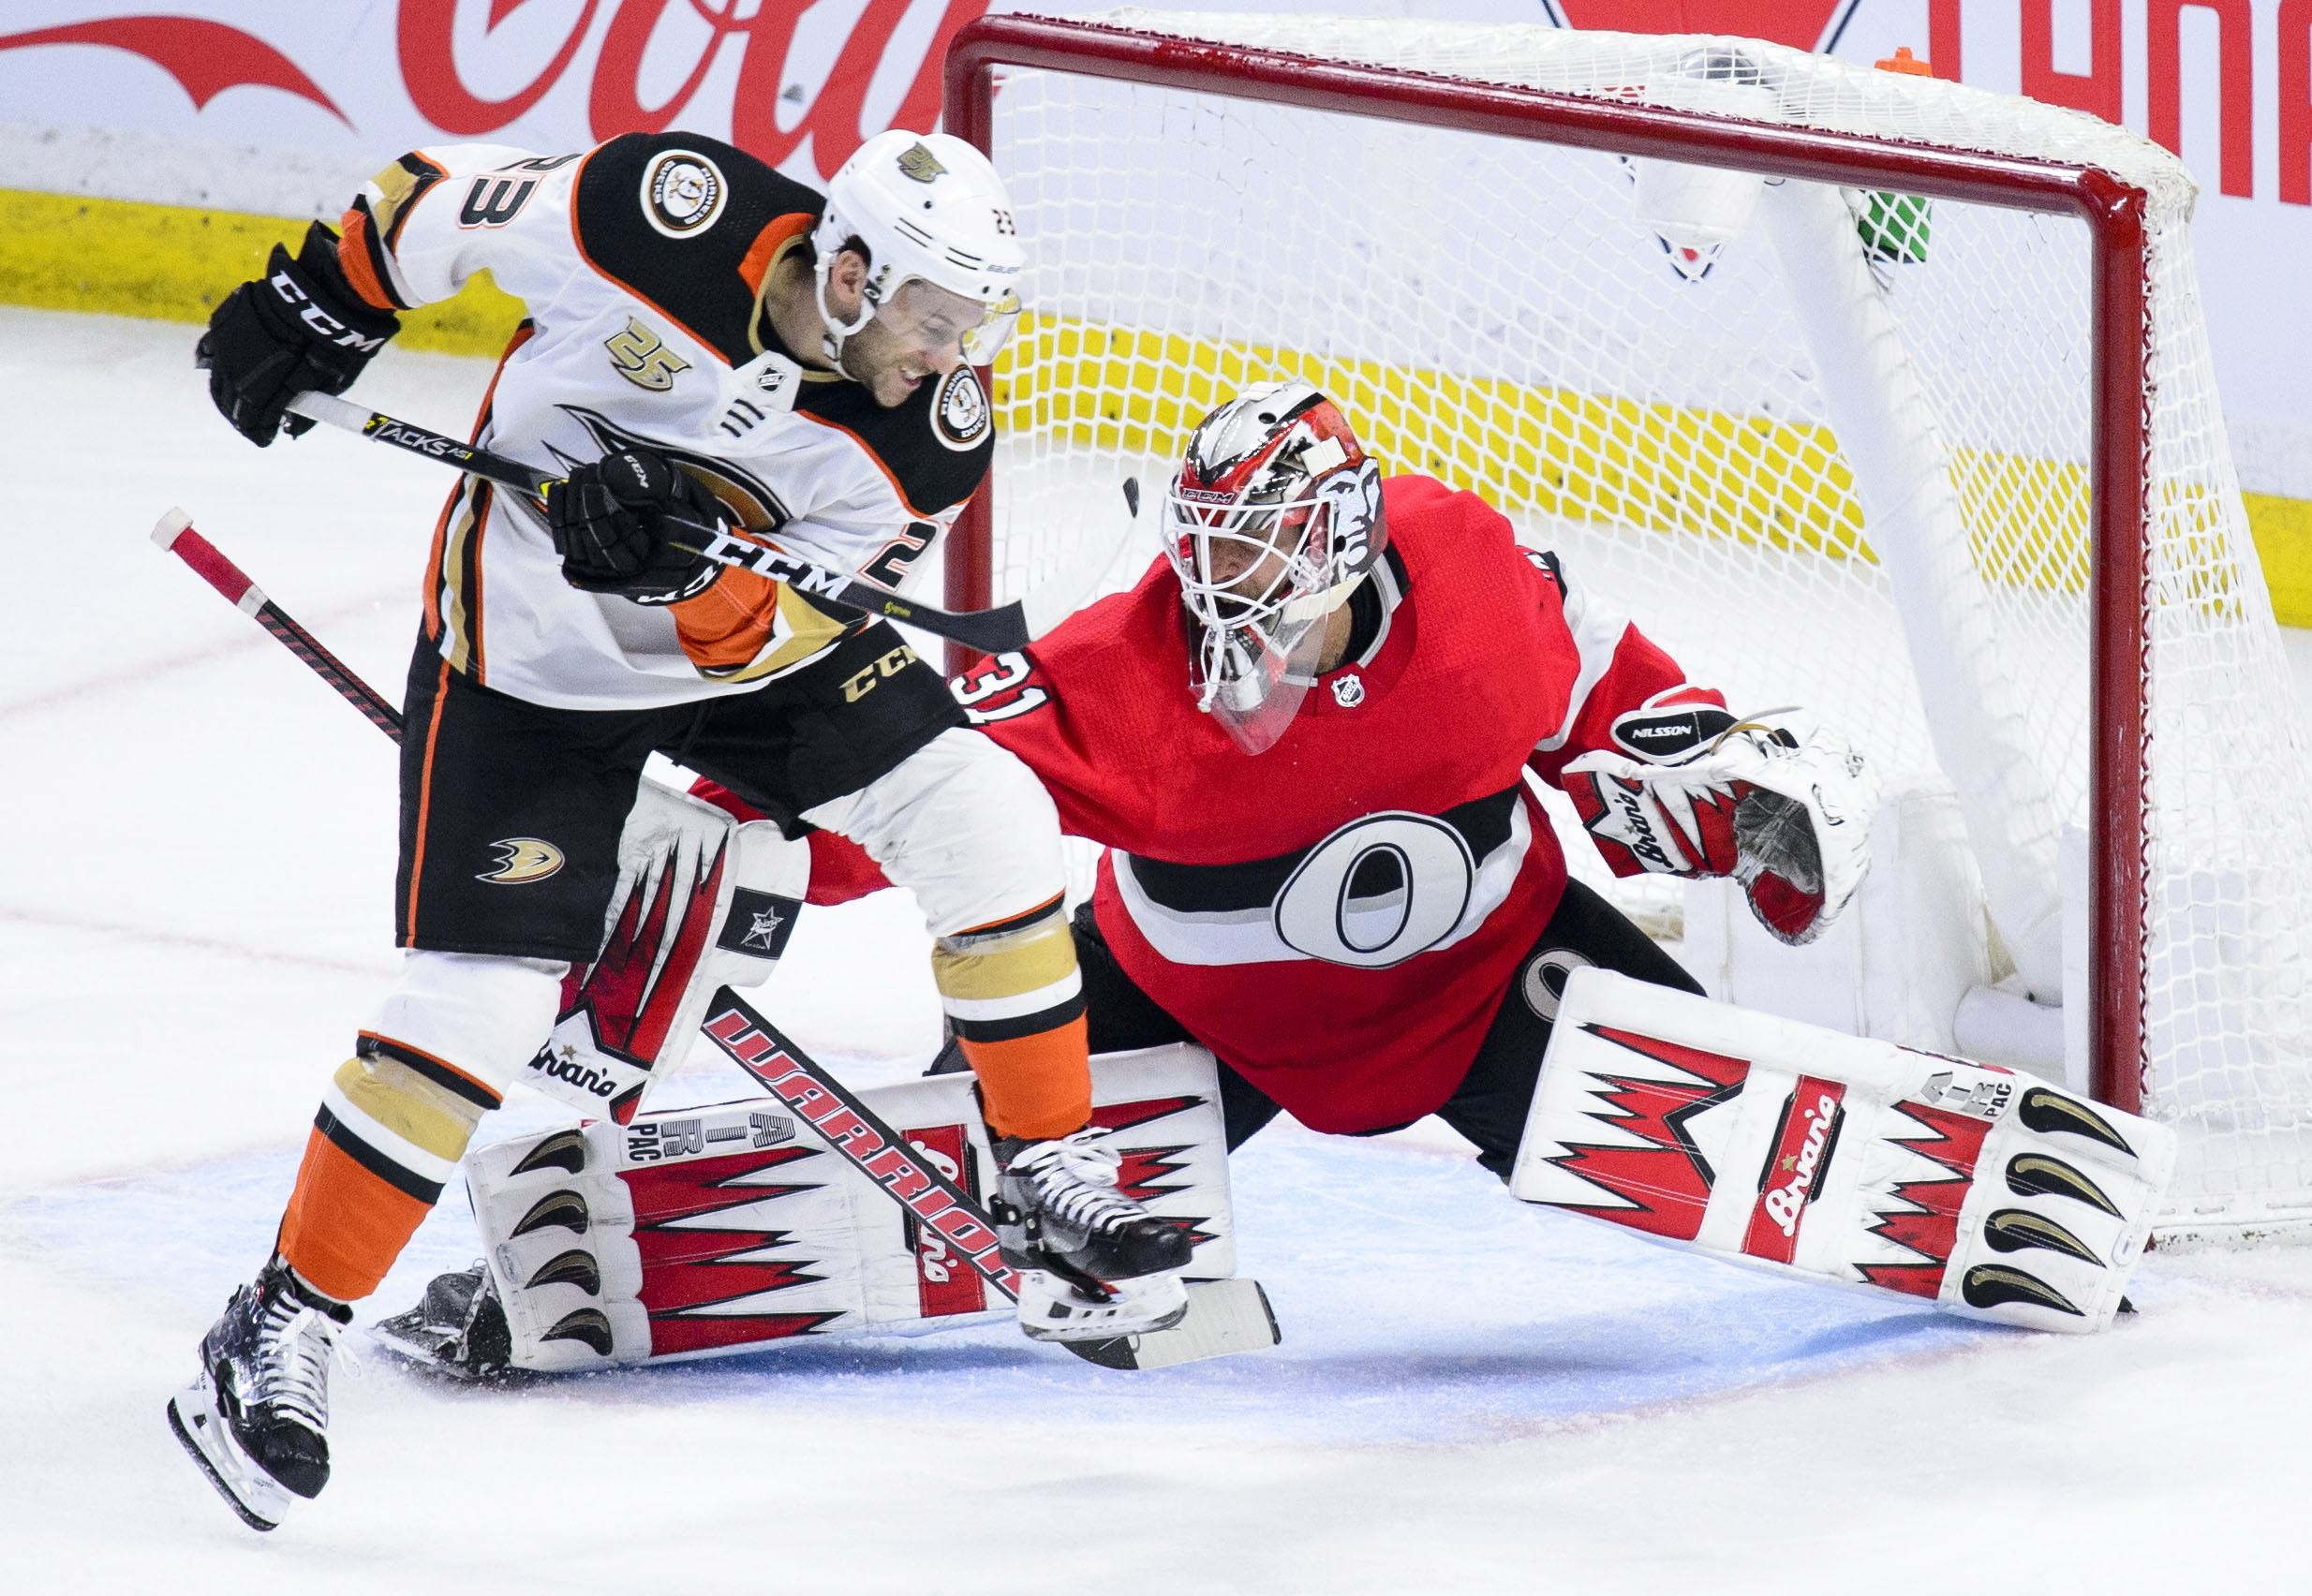 Nilsson stops 45 shots, Senators beat Ducks 4-0